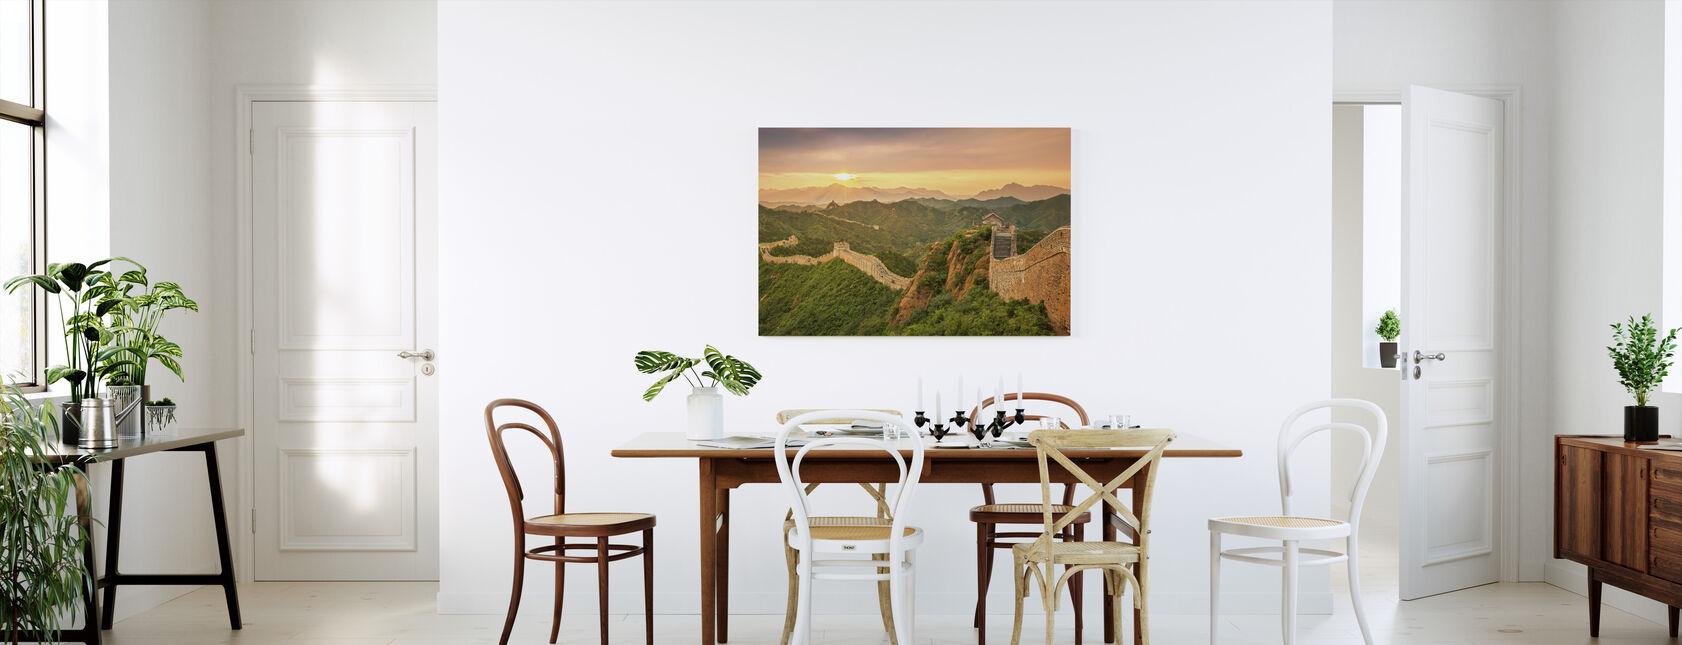 Grote Muur van China bij zonsopgang - Canvas print - Keuken